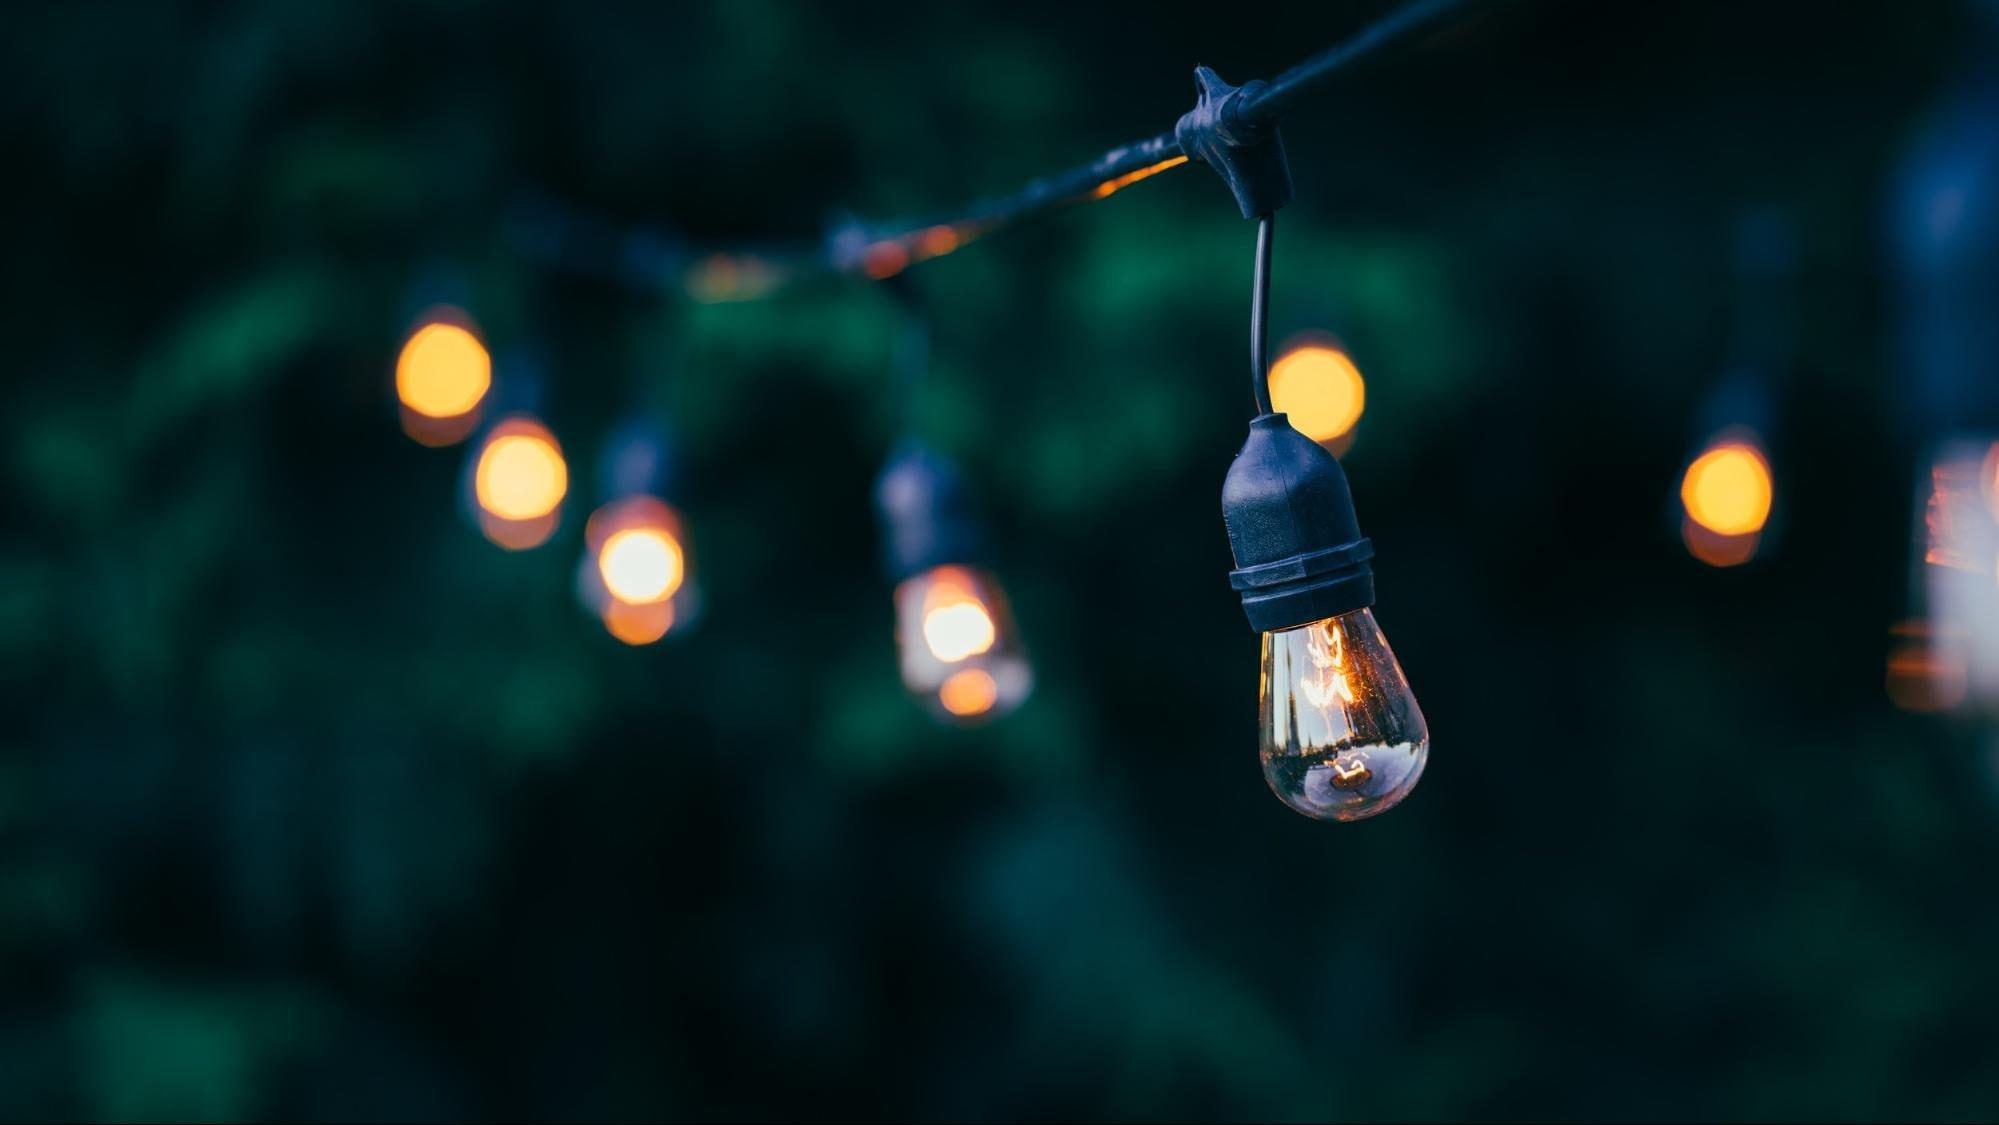 Outdoor light bulbs bokeh